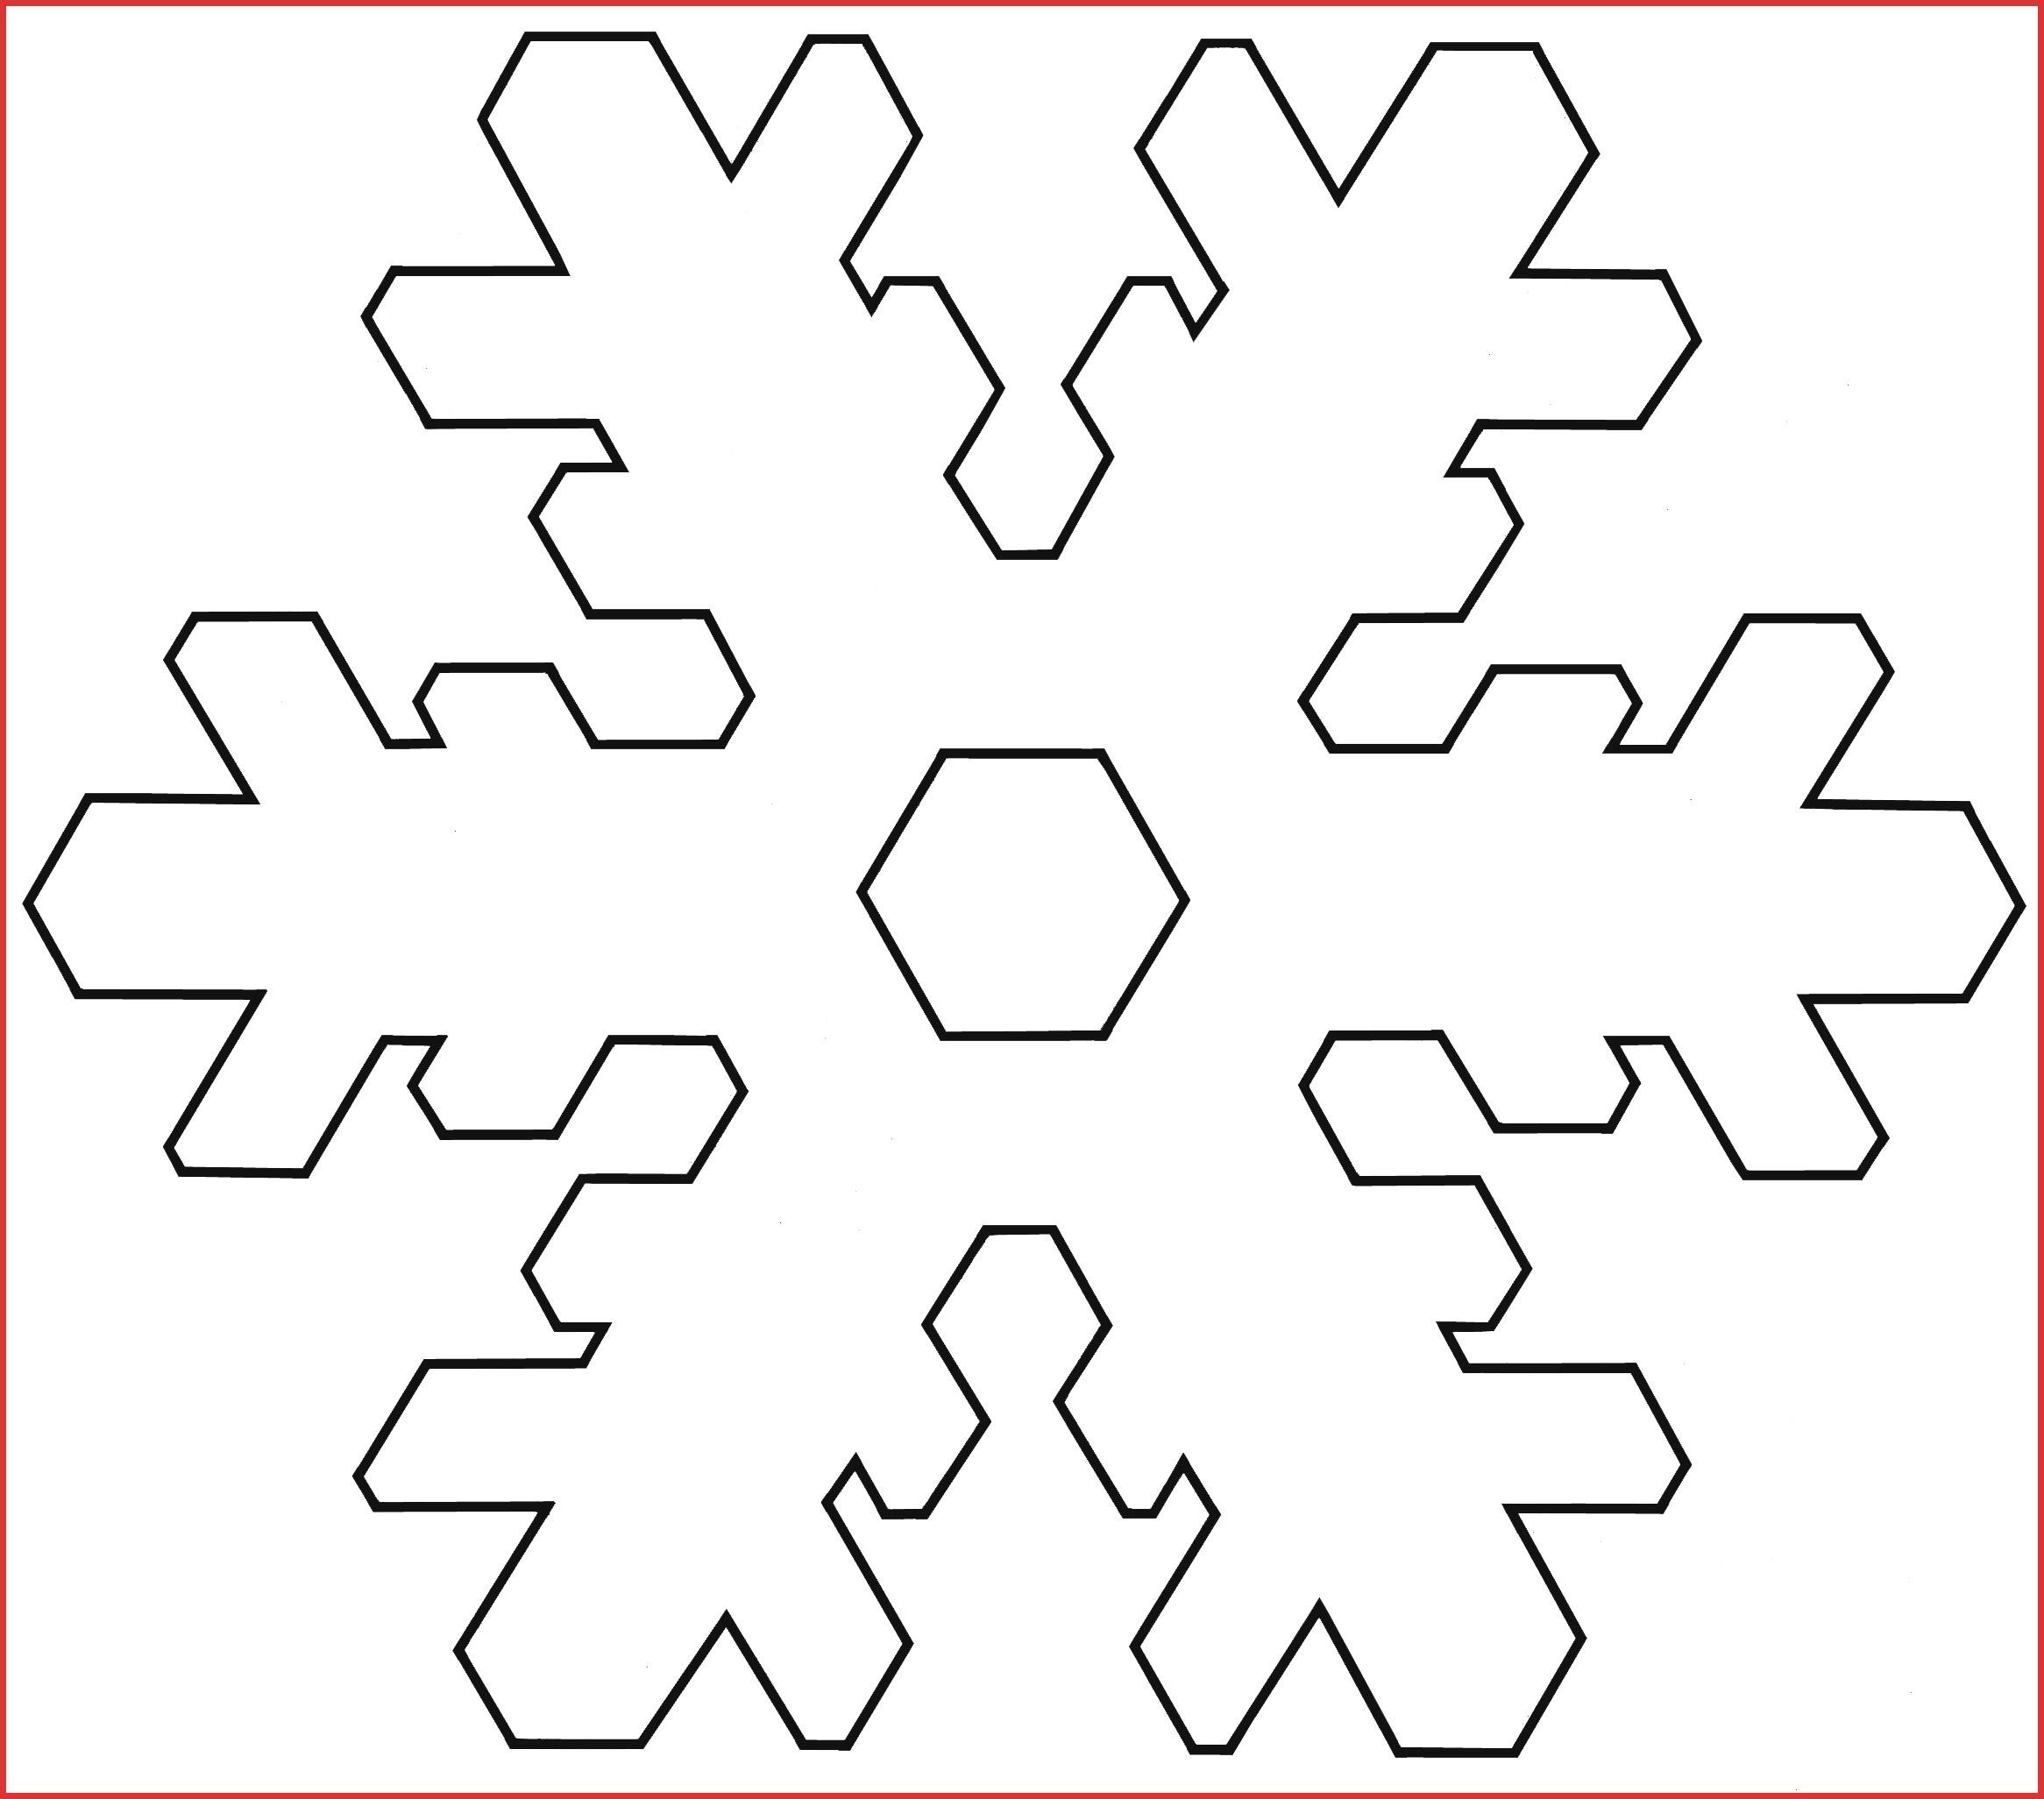 Inspirational Printable Snowflakes | Cobble Usa - Free Printable Snowflake Patterns